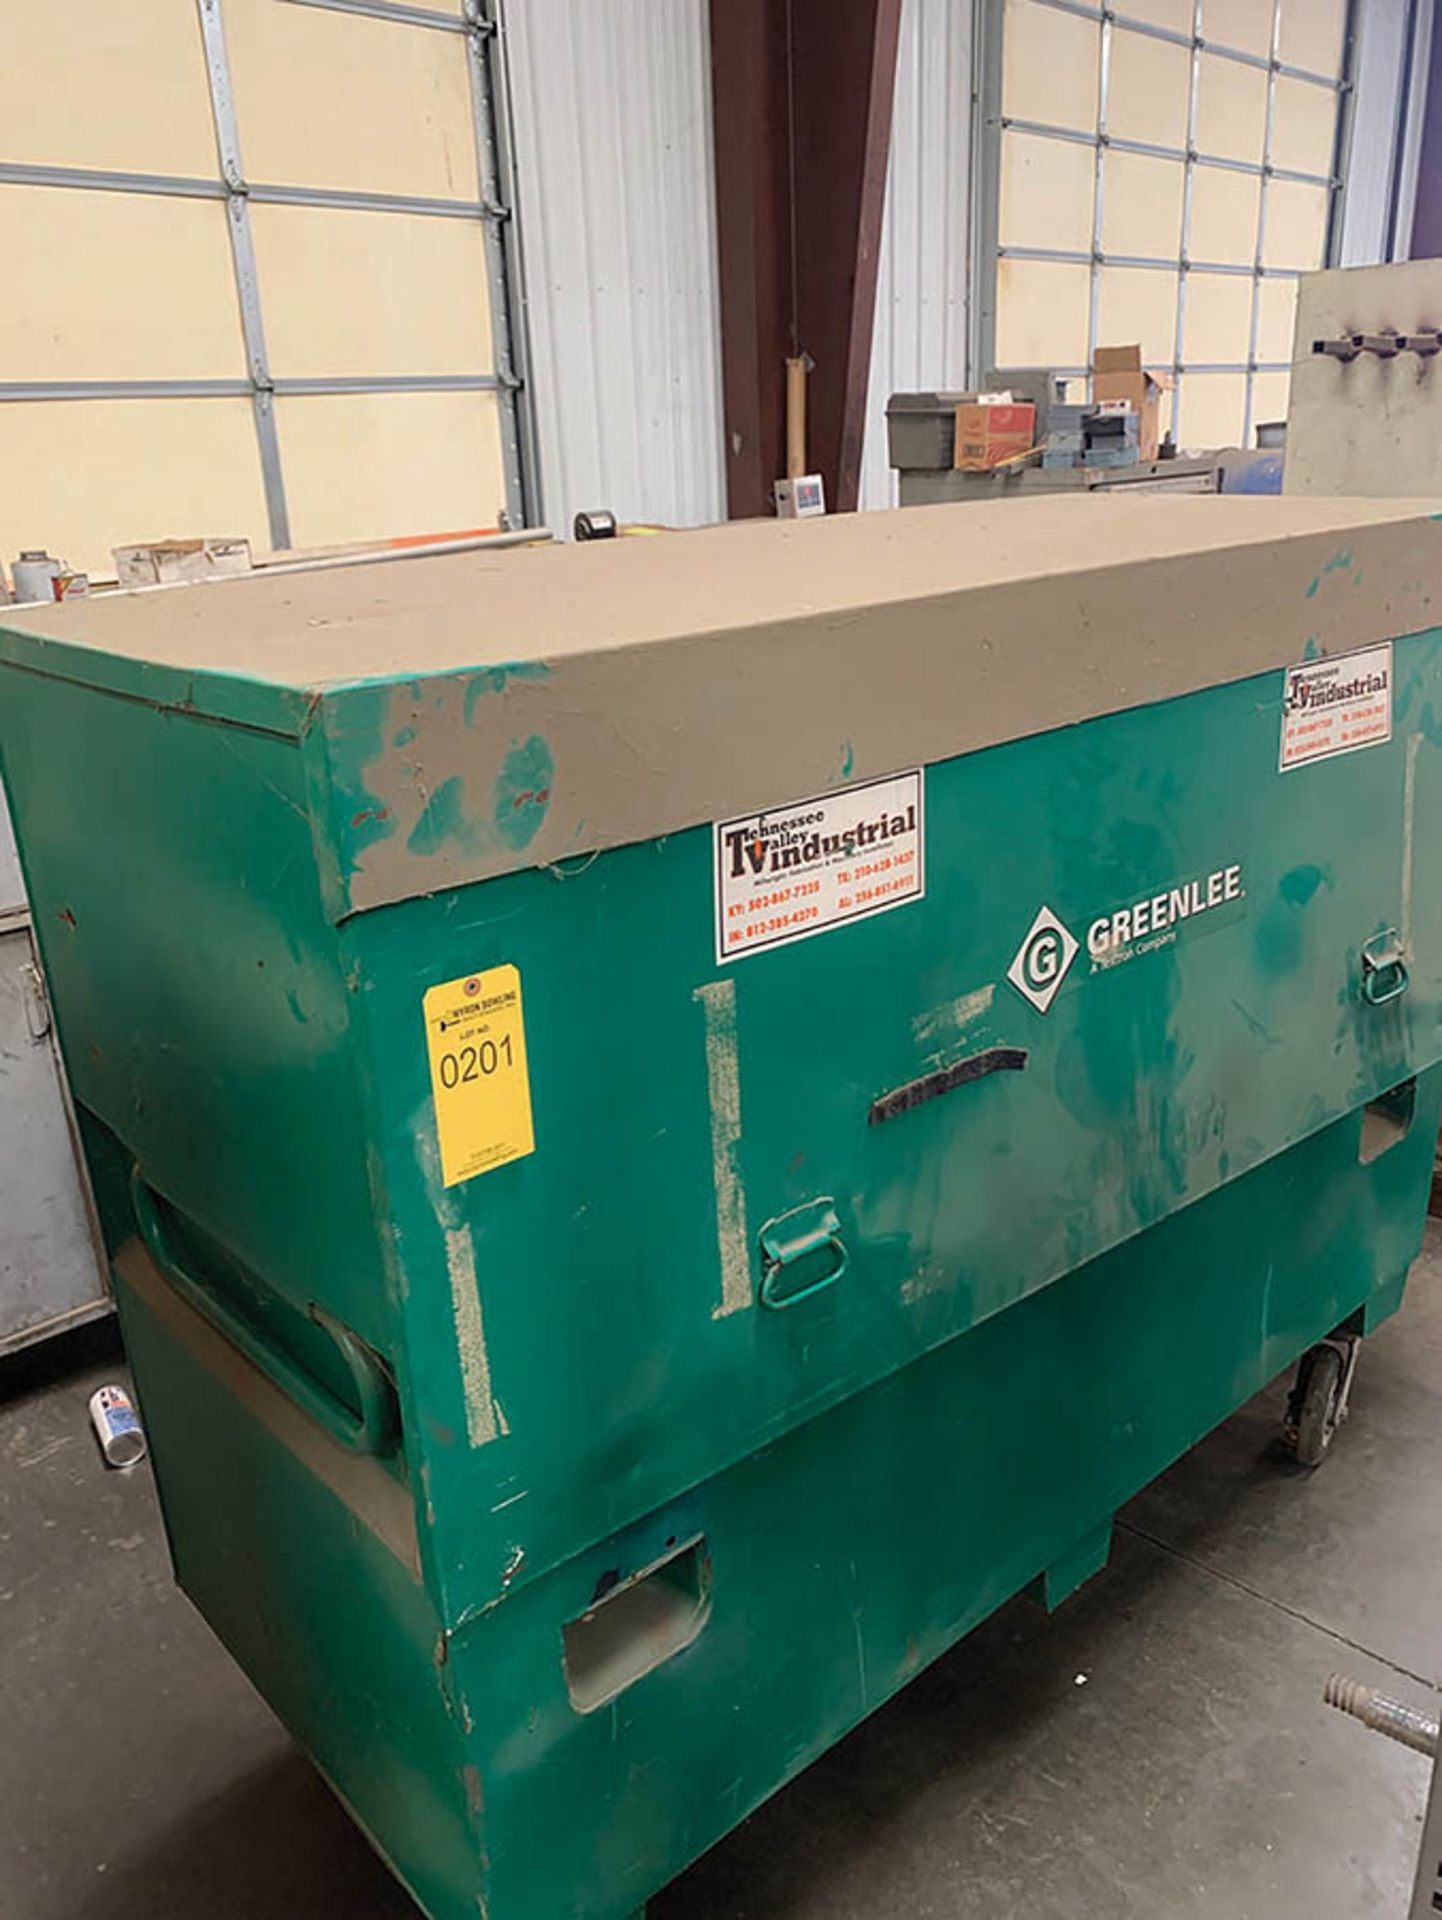 Lot 201 - GREENLEE JOB BOX ON CASTERS